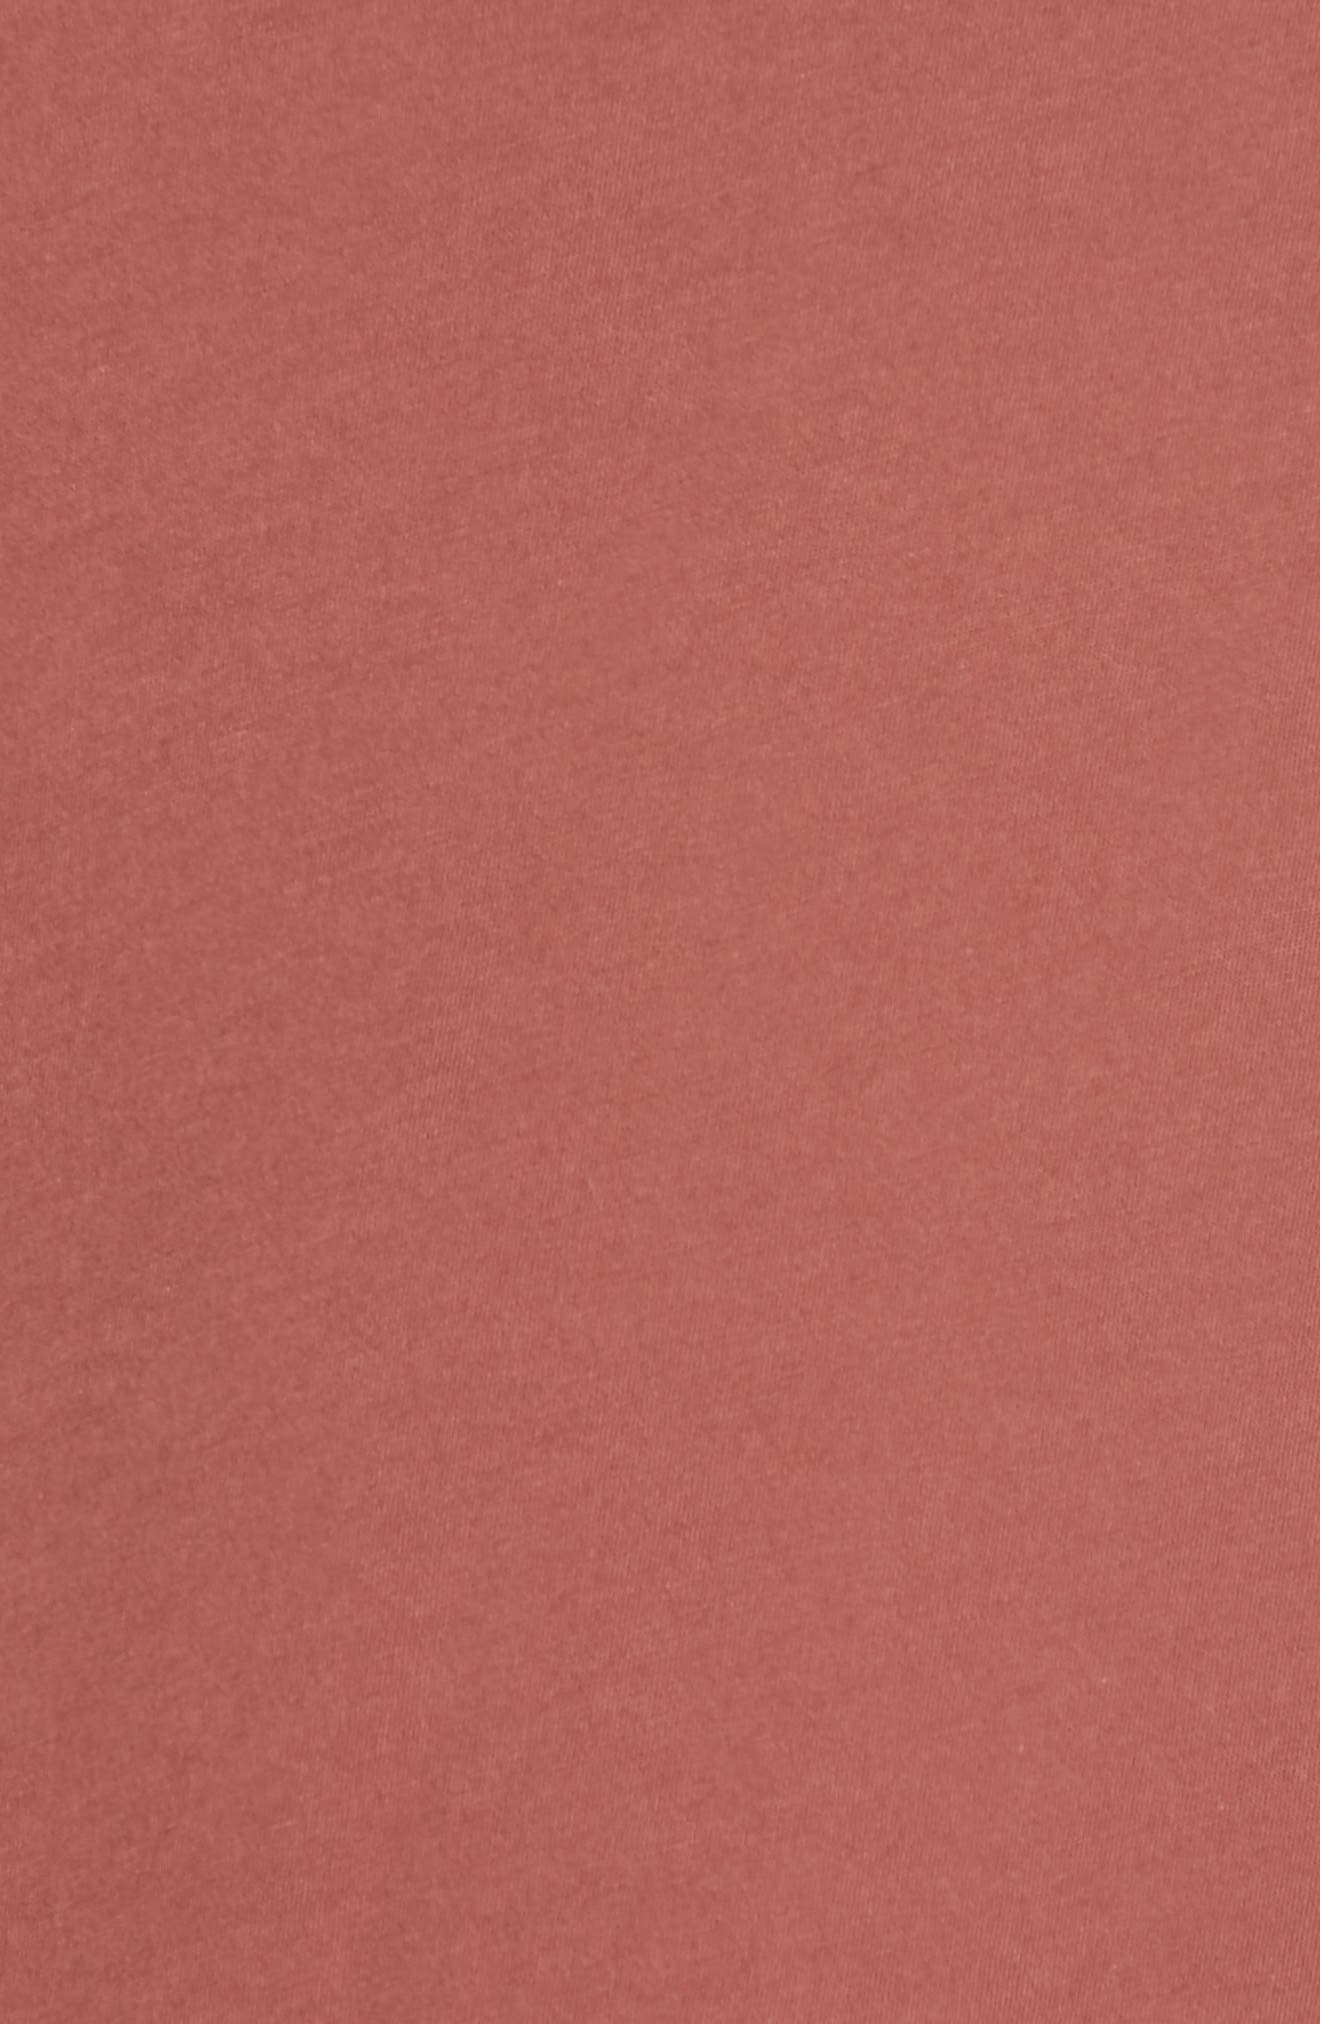 Jones Cover-Up Dress,                             Alternate thumbnail 5, color,                             VINTAGE BERRY